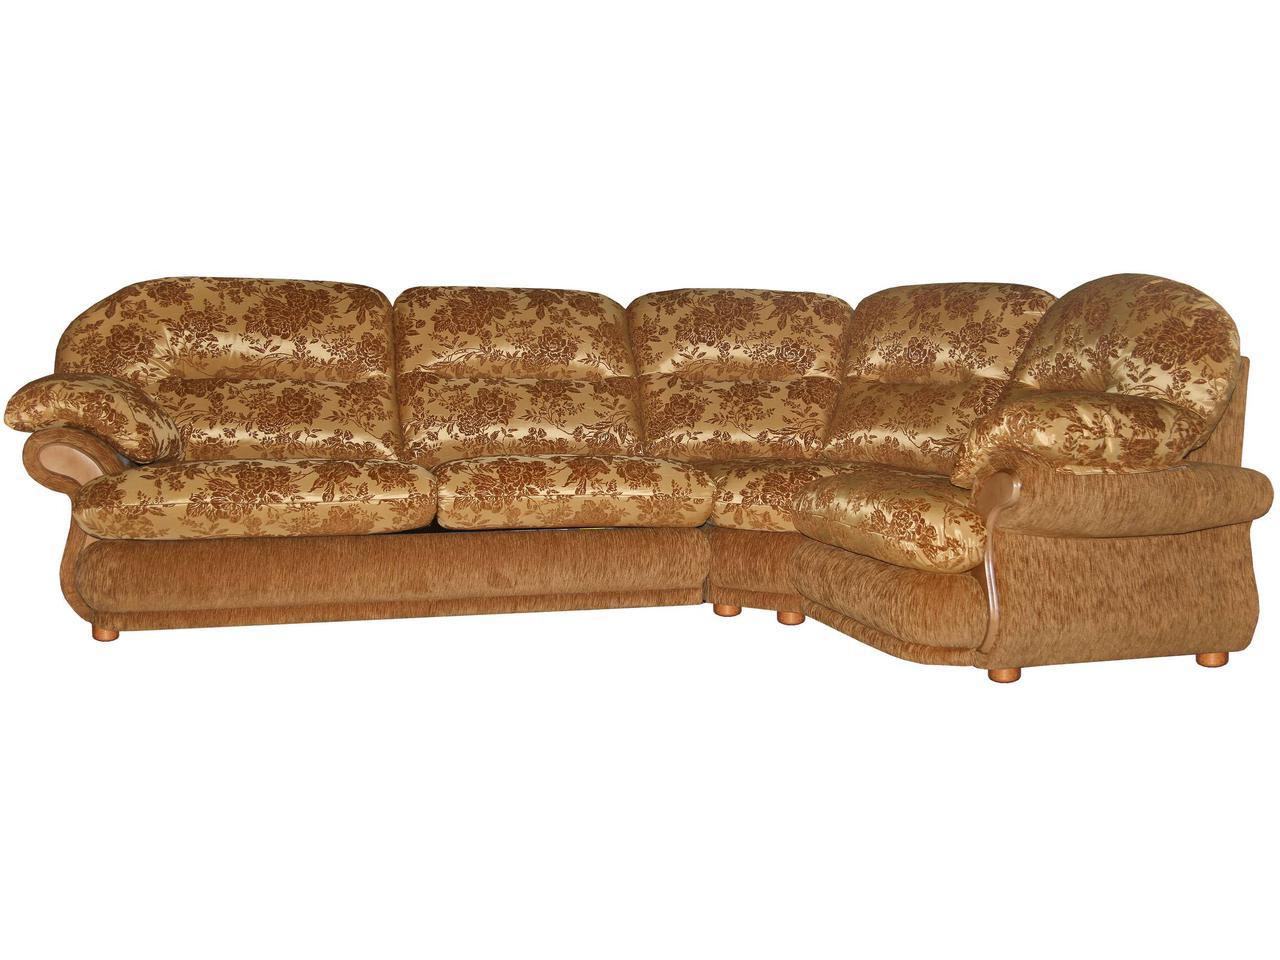 Диван Orlando, мягкий диван, раскладной диван